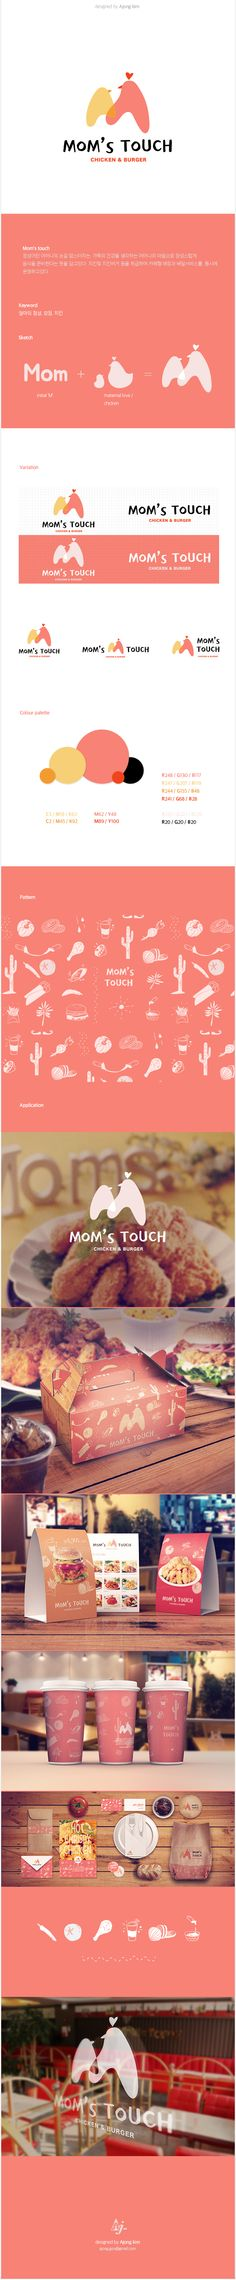 mom's touch Brand identity '맘스터치' 브랜드 아이덴티티 on Behance